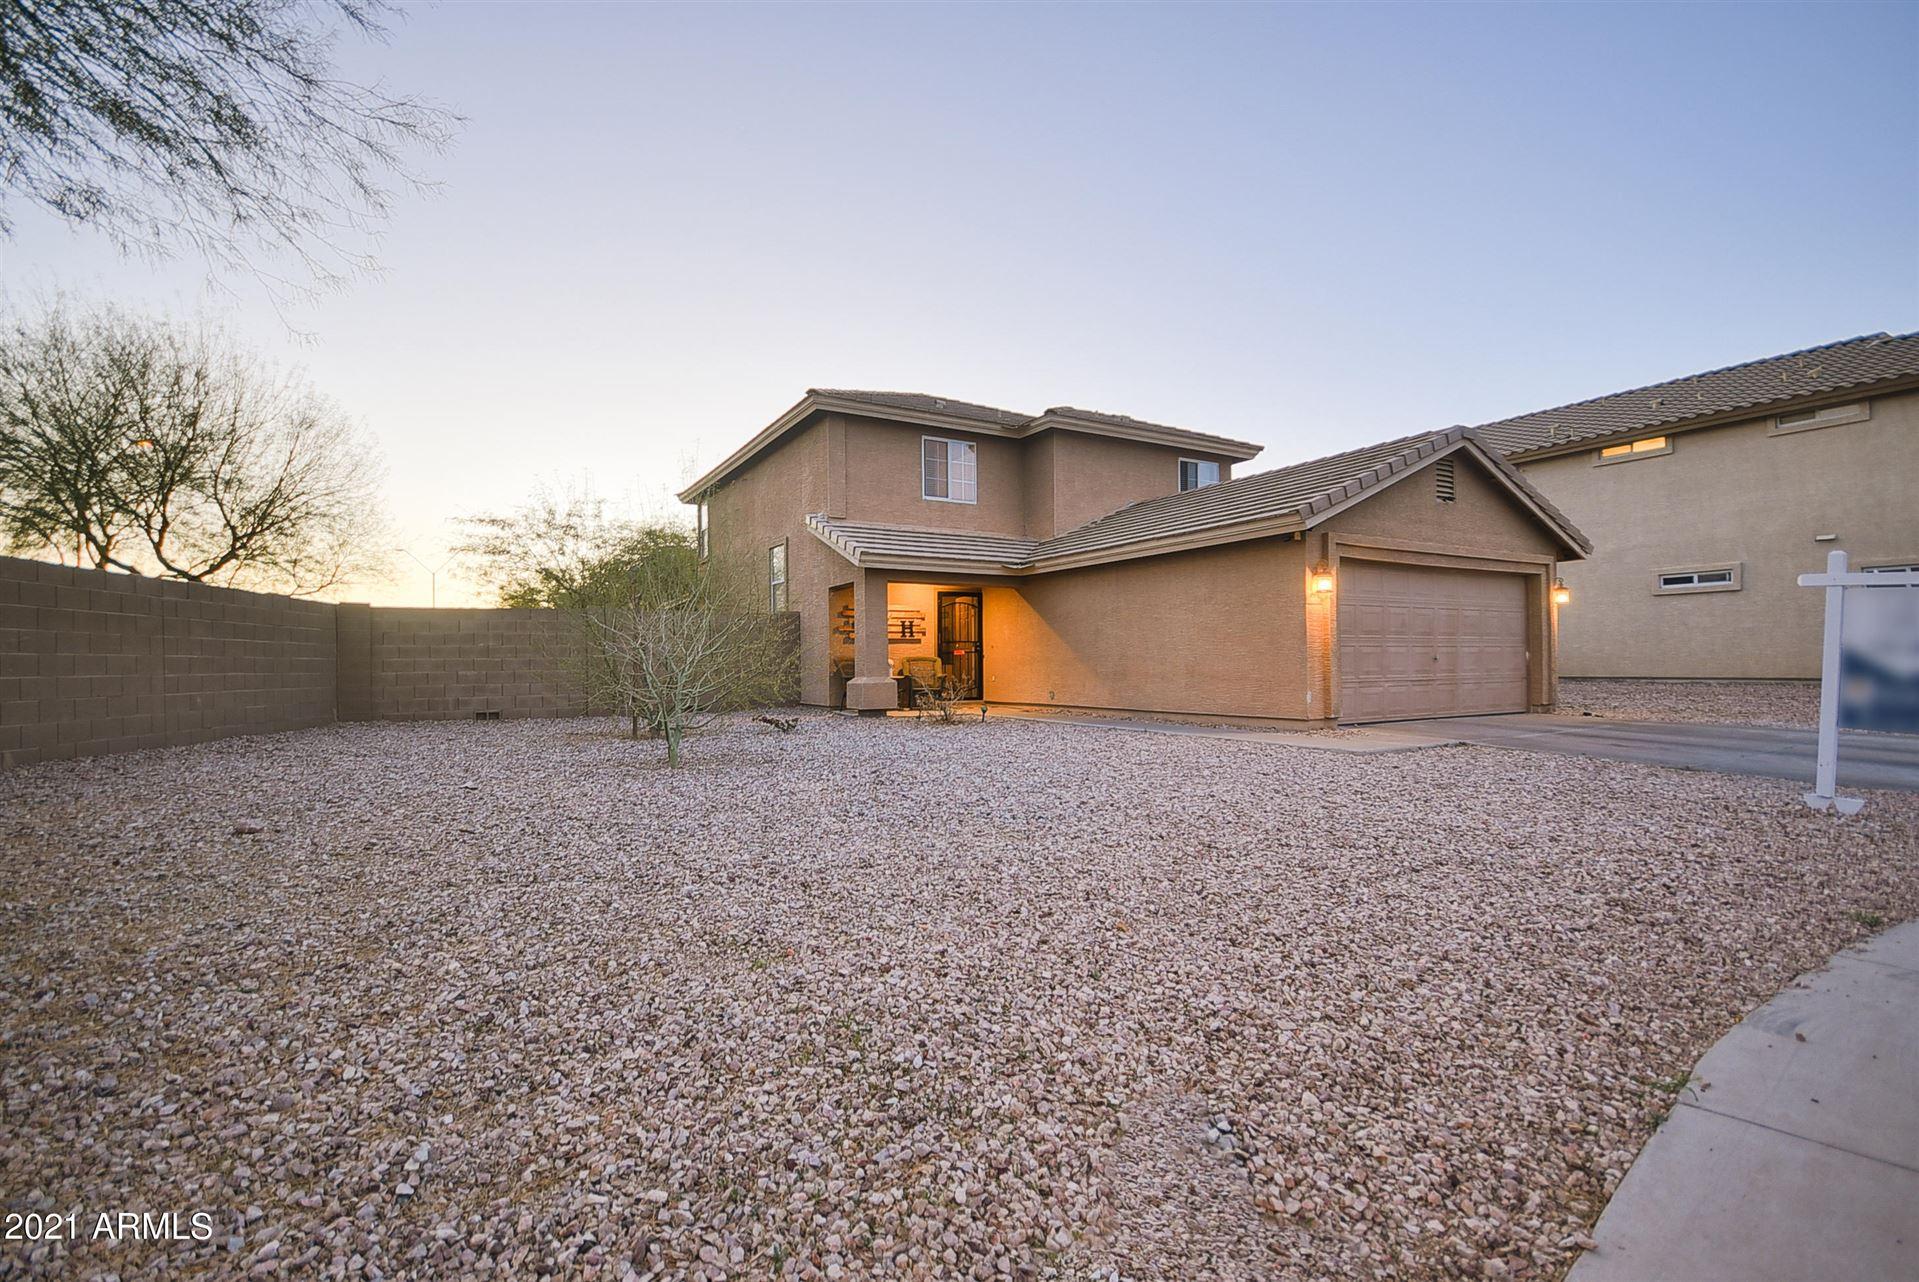 Photo of 1142 S 225TH Avenue, Buckeye, AZ 85326 (MLS # 6203391)